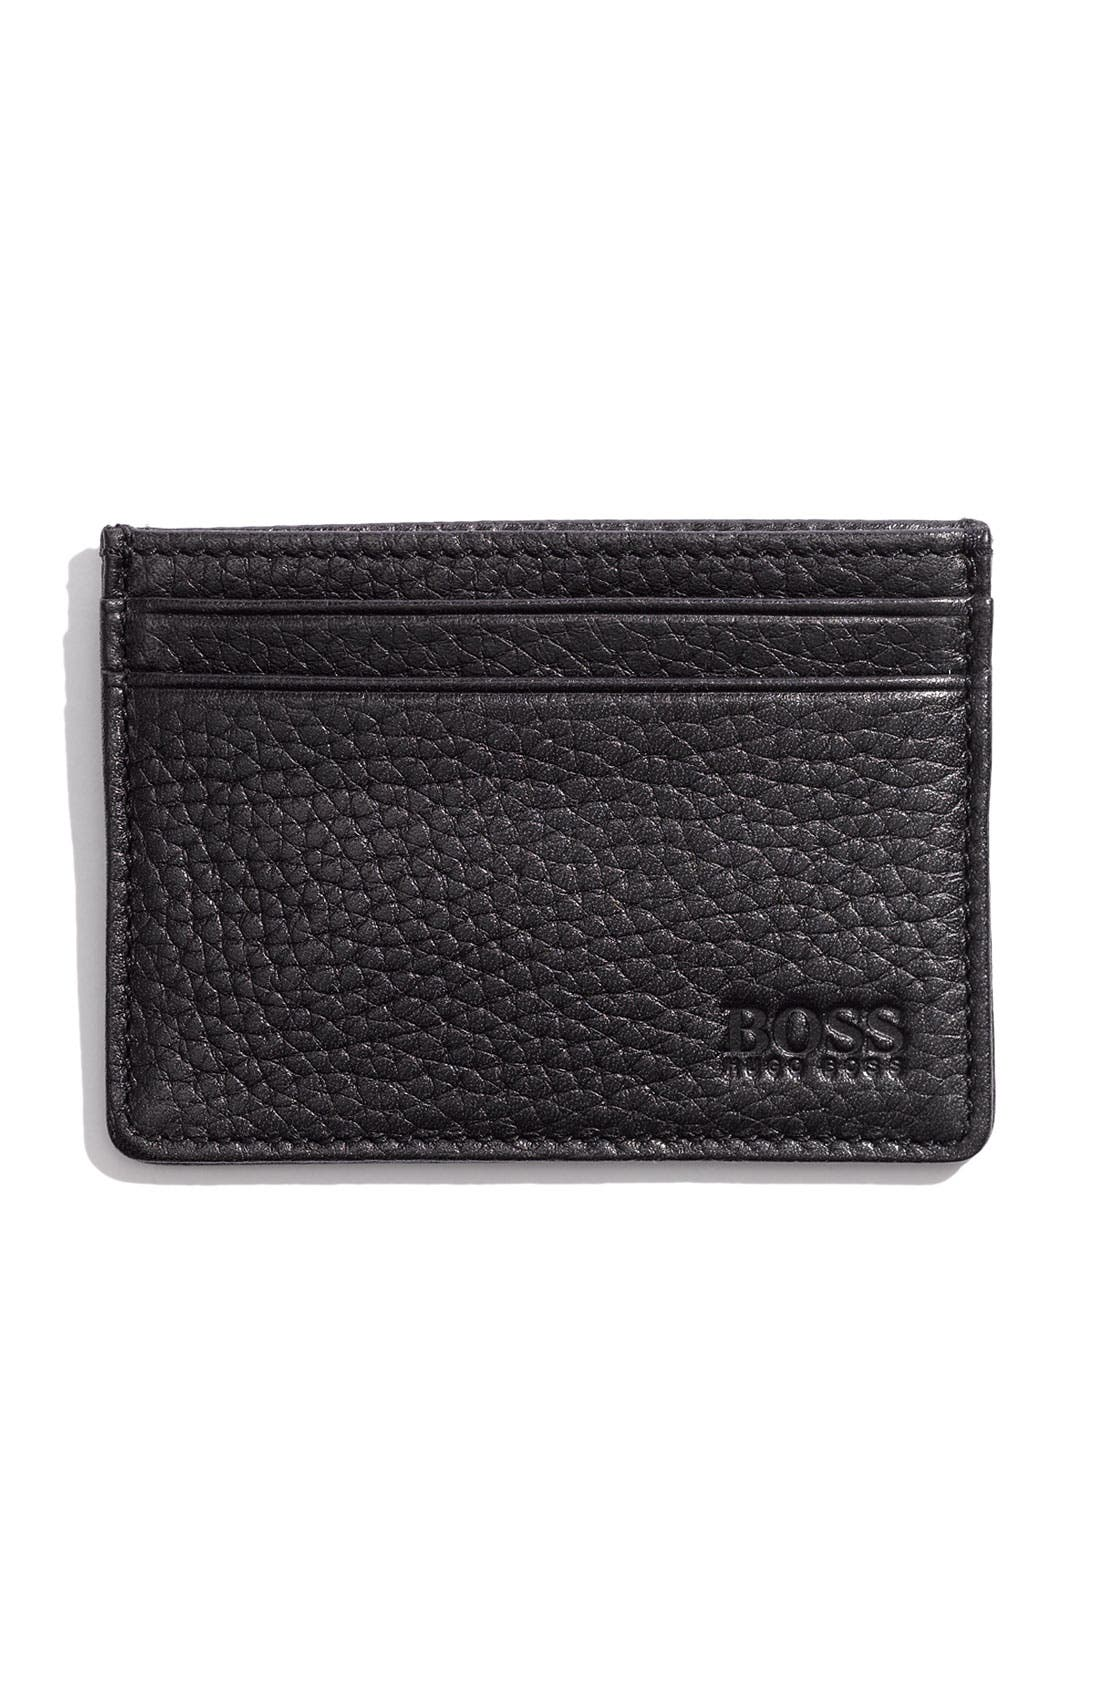 Main Image - BOSS HUGO BOSS 'Bradenton' Leather Card Case